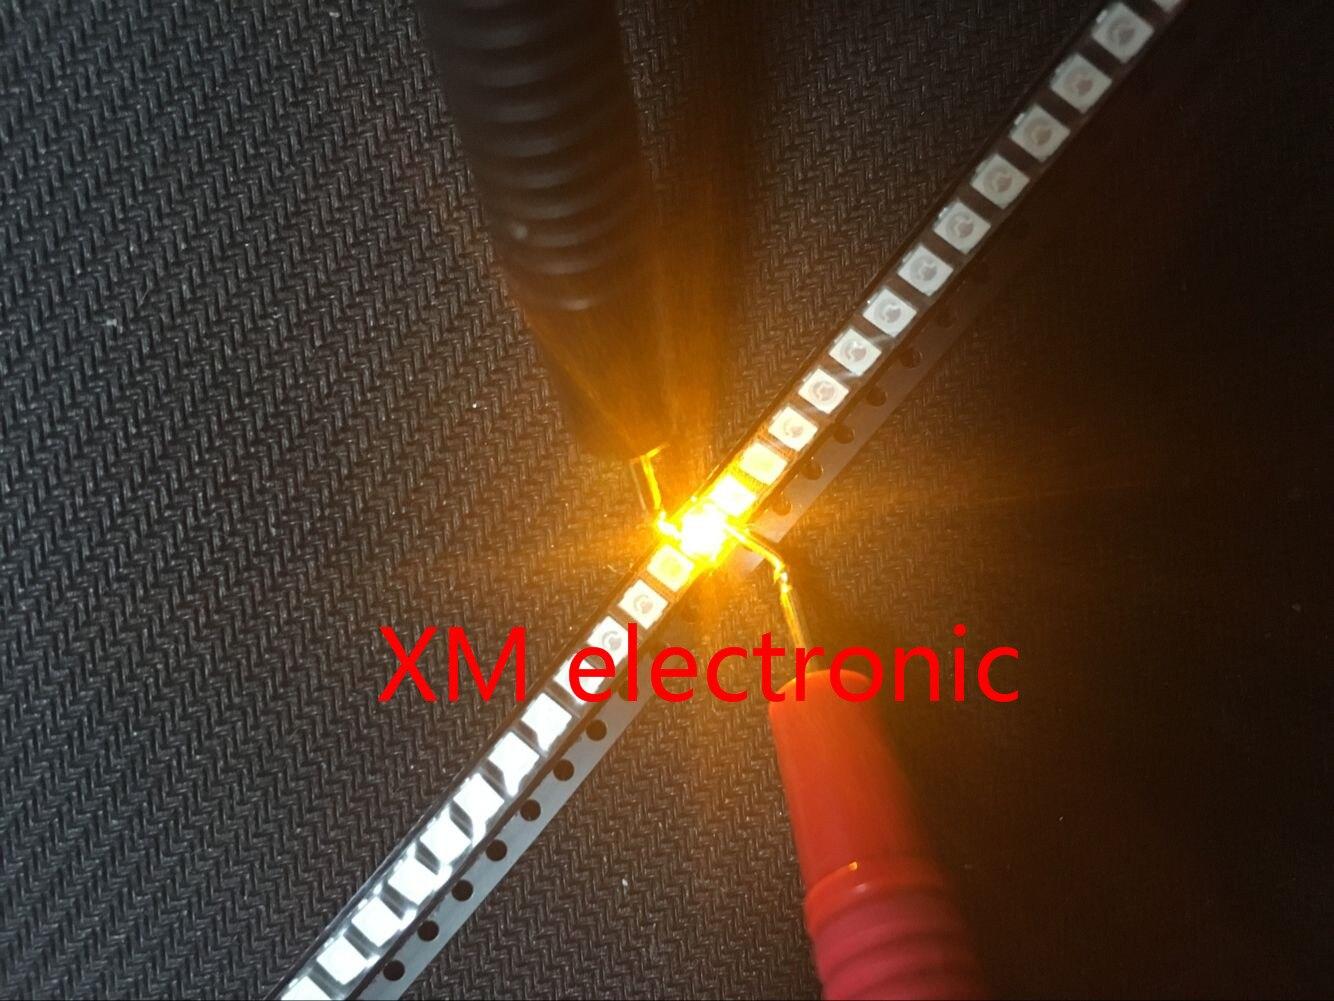 100 pces power top 1210 3528 amarelo smd smt PLCC-2 1500mcd ultra brilhante led novo